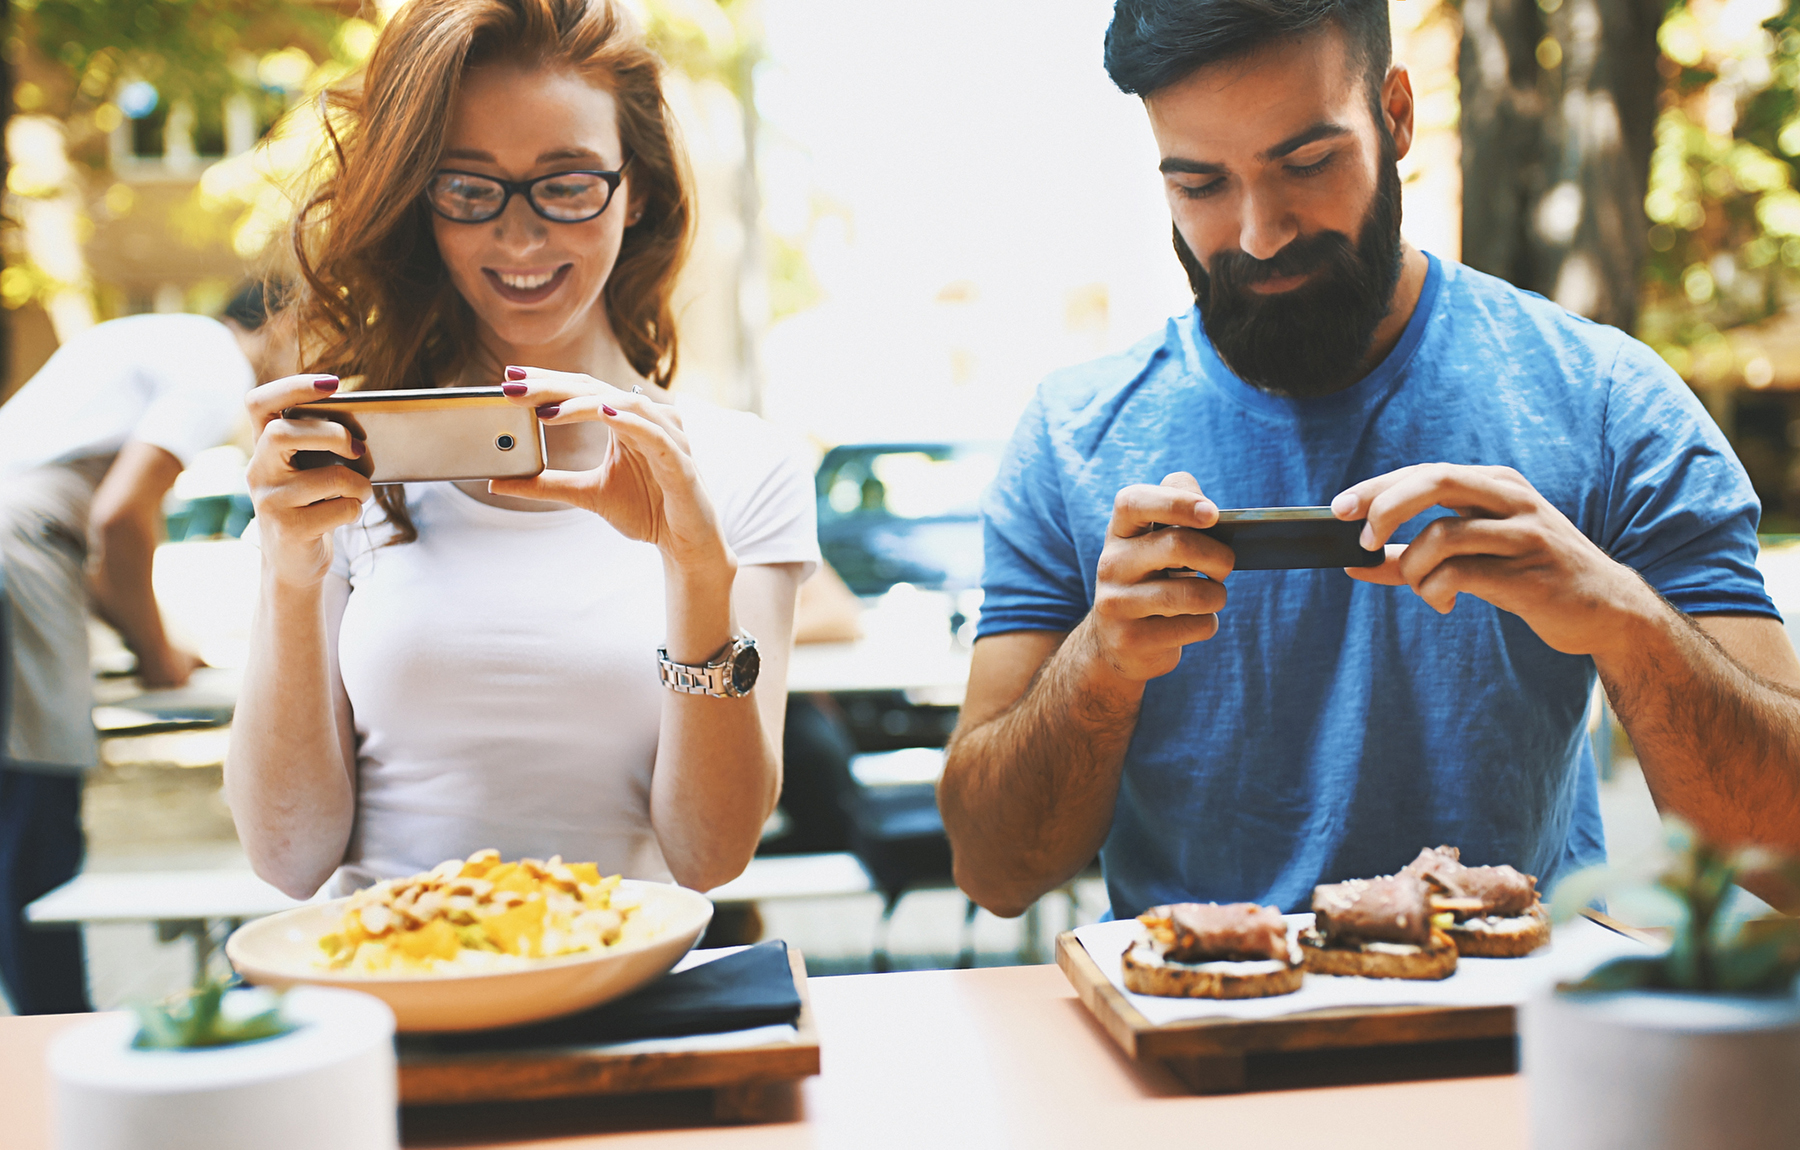 Setting Boundaries for Social Media